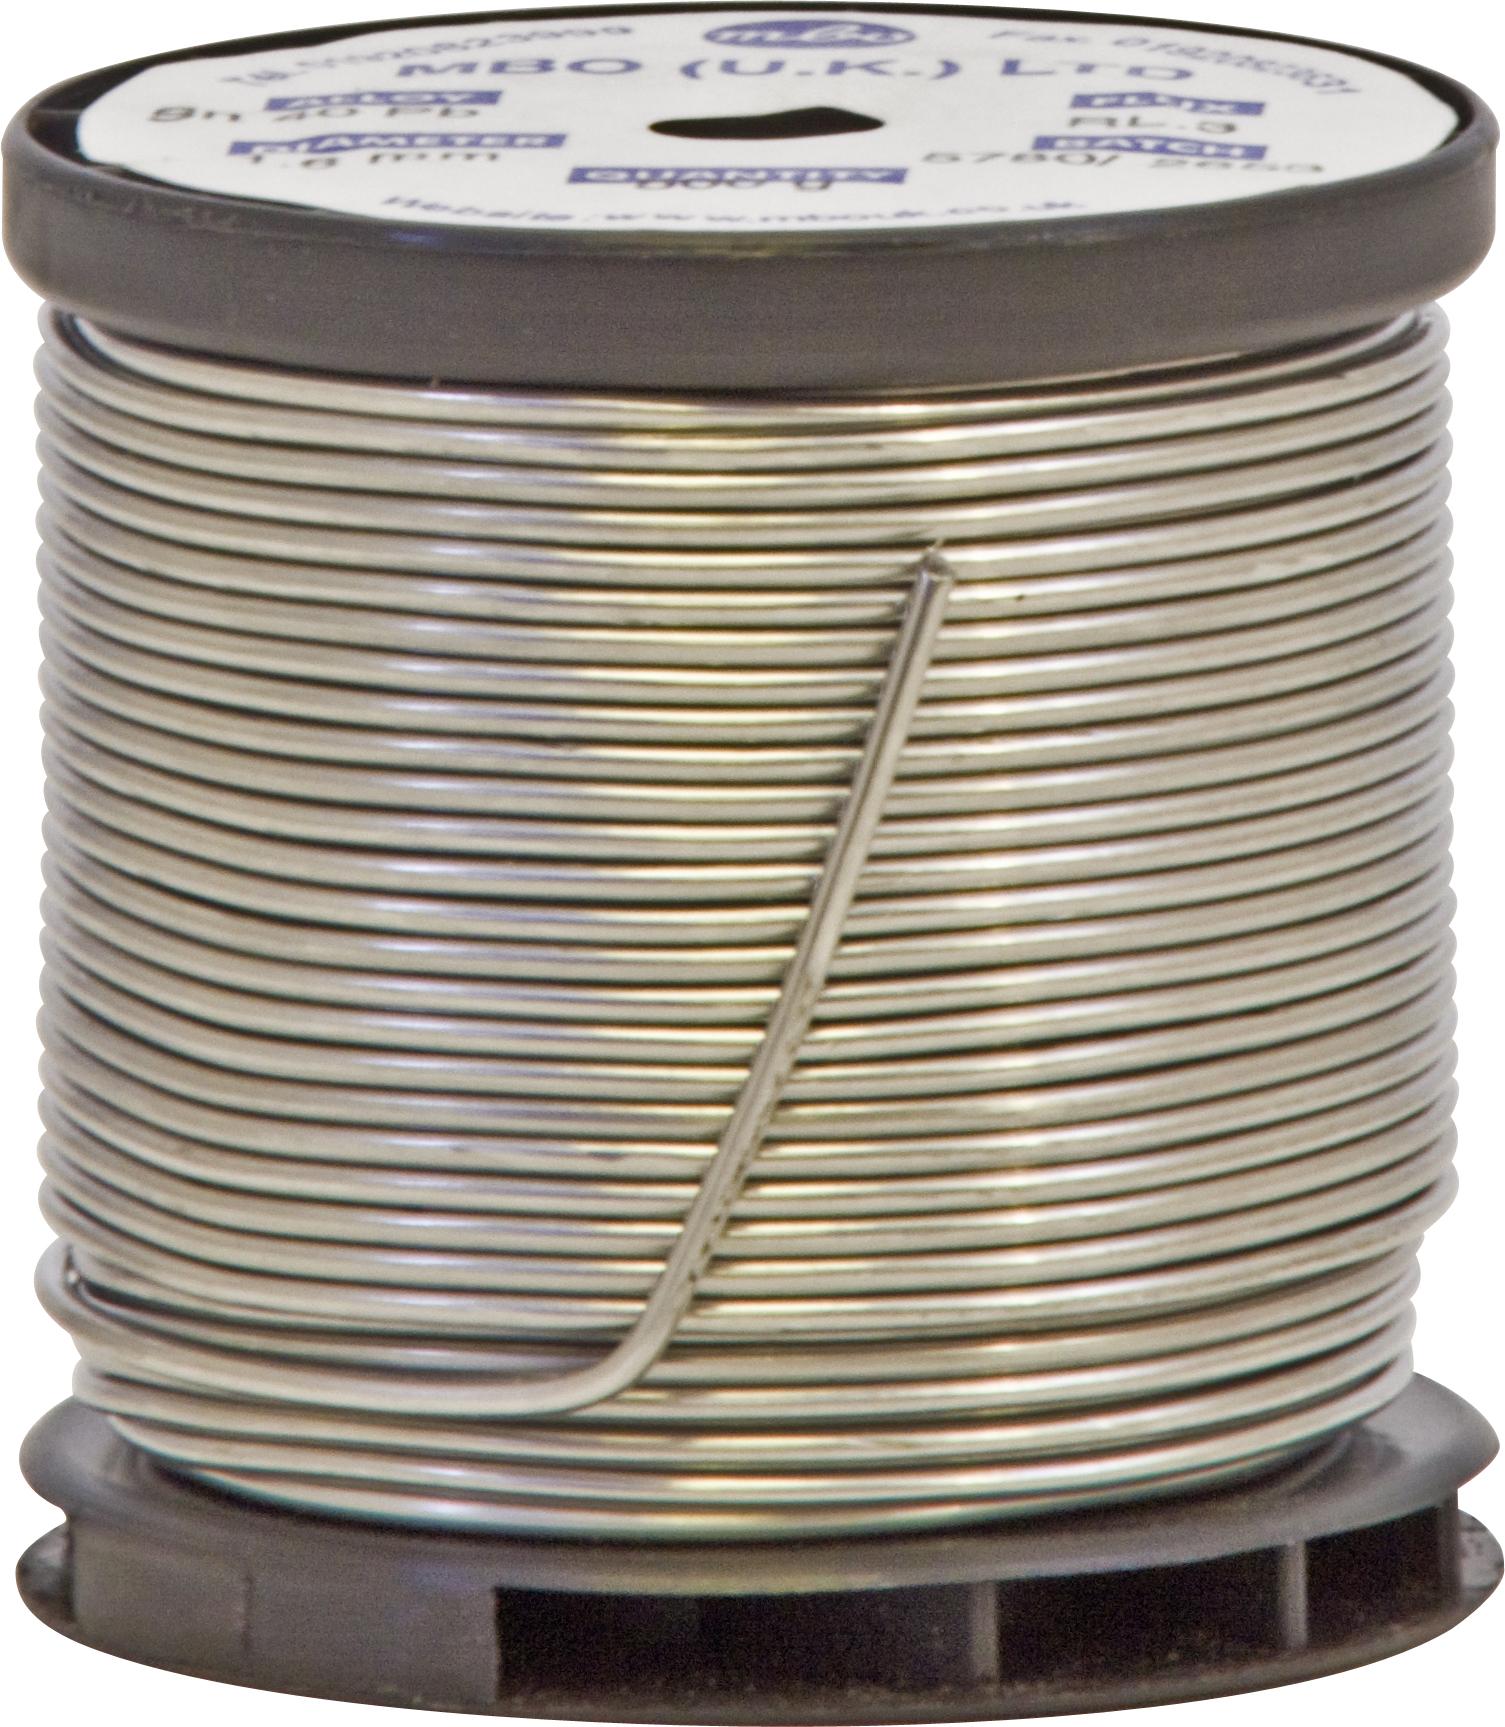 Solder Wire 16mm 16 Swg 05kg Coil General Purpose Soldering So2